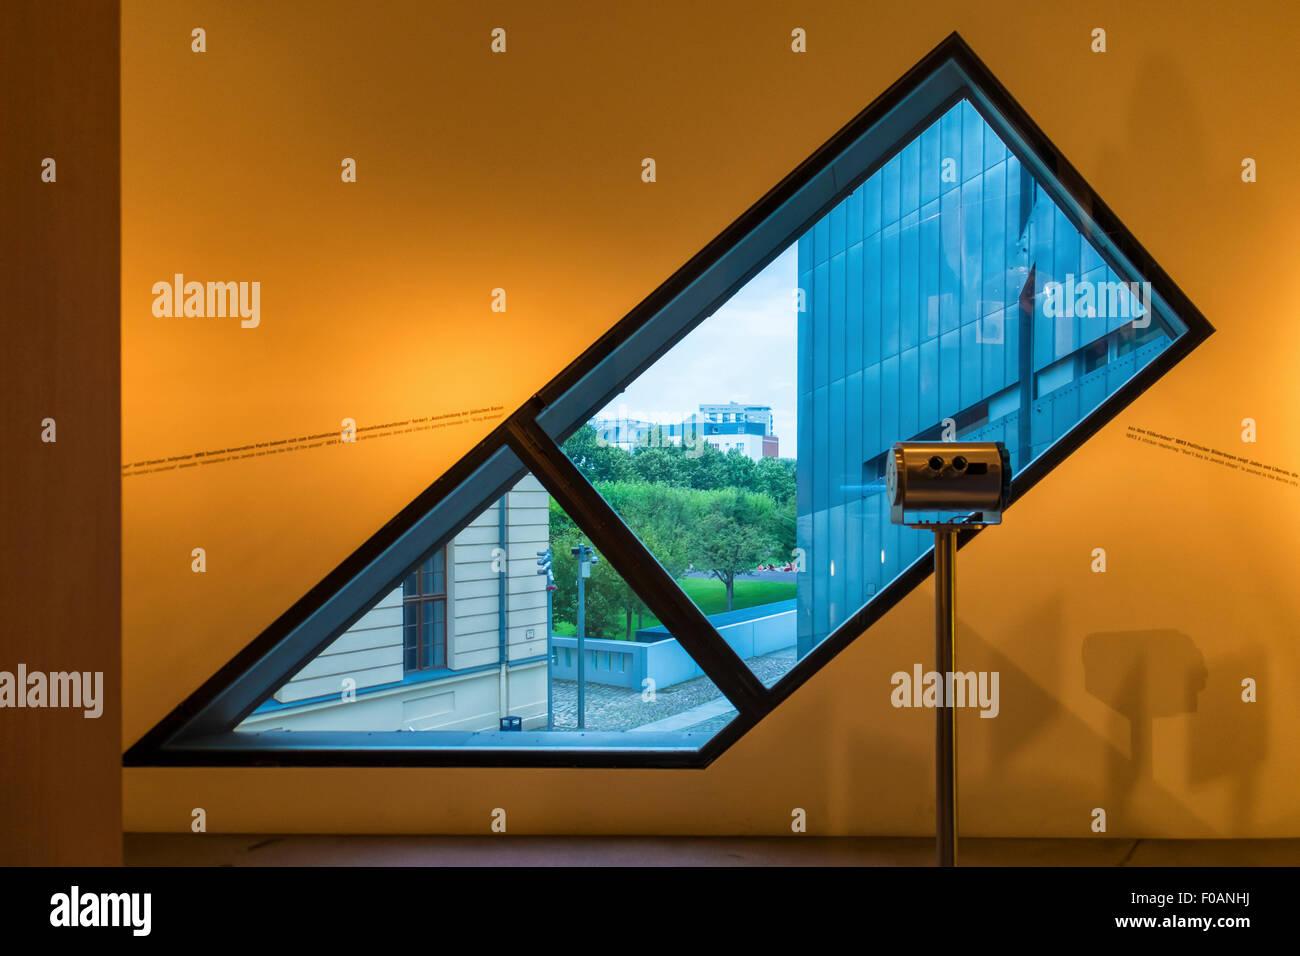 Berlin Jewish Museum Jüdisches Museum interior -  unusual angular window and view of garden - Stock Image